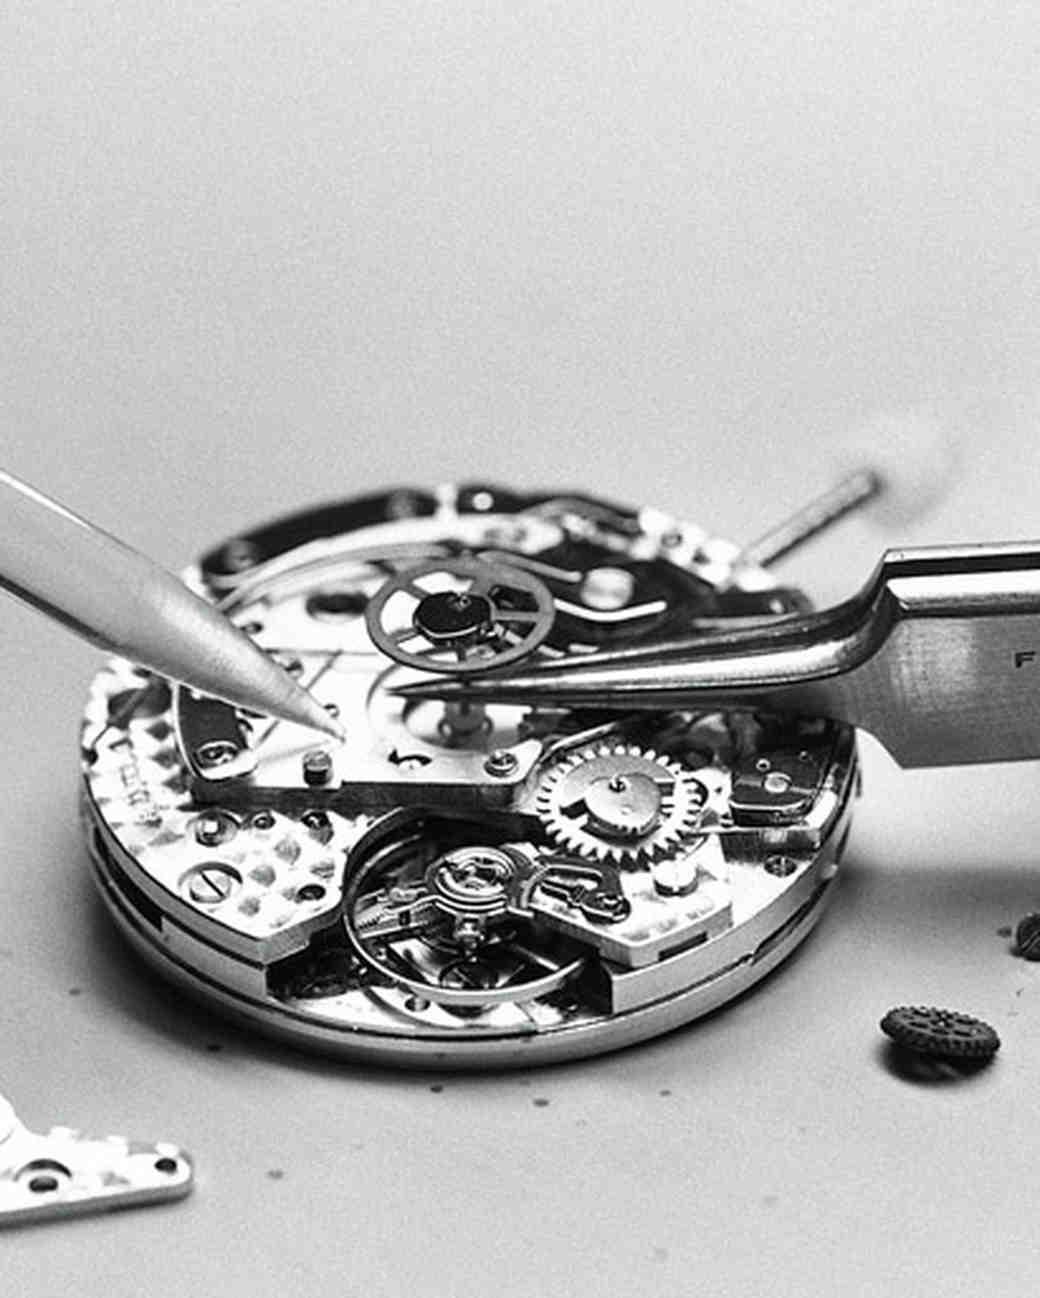 baume-mercier-watch-watch-care-2-0514.jpg